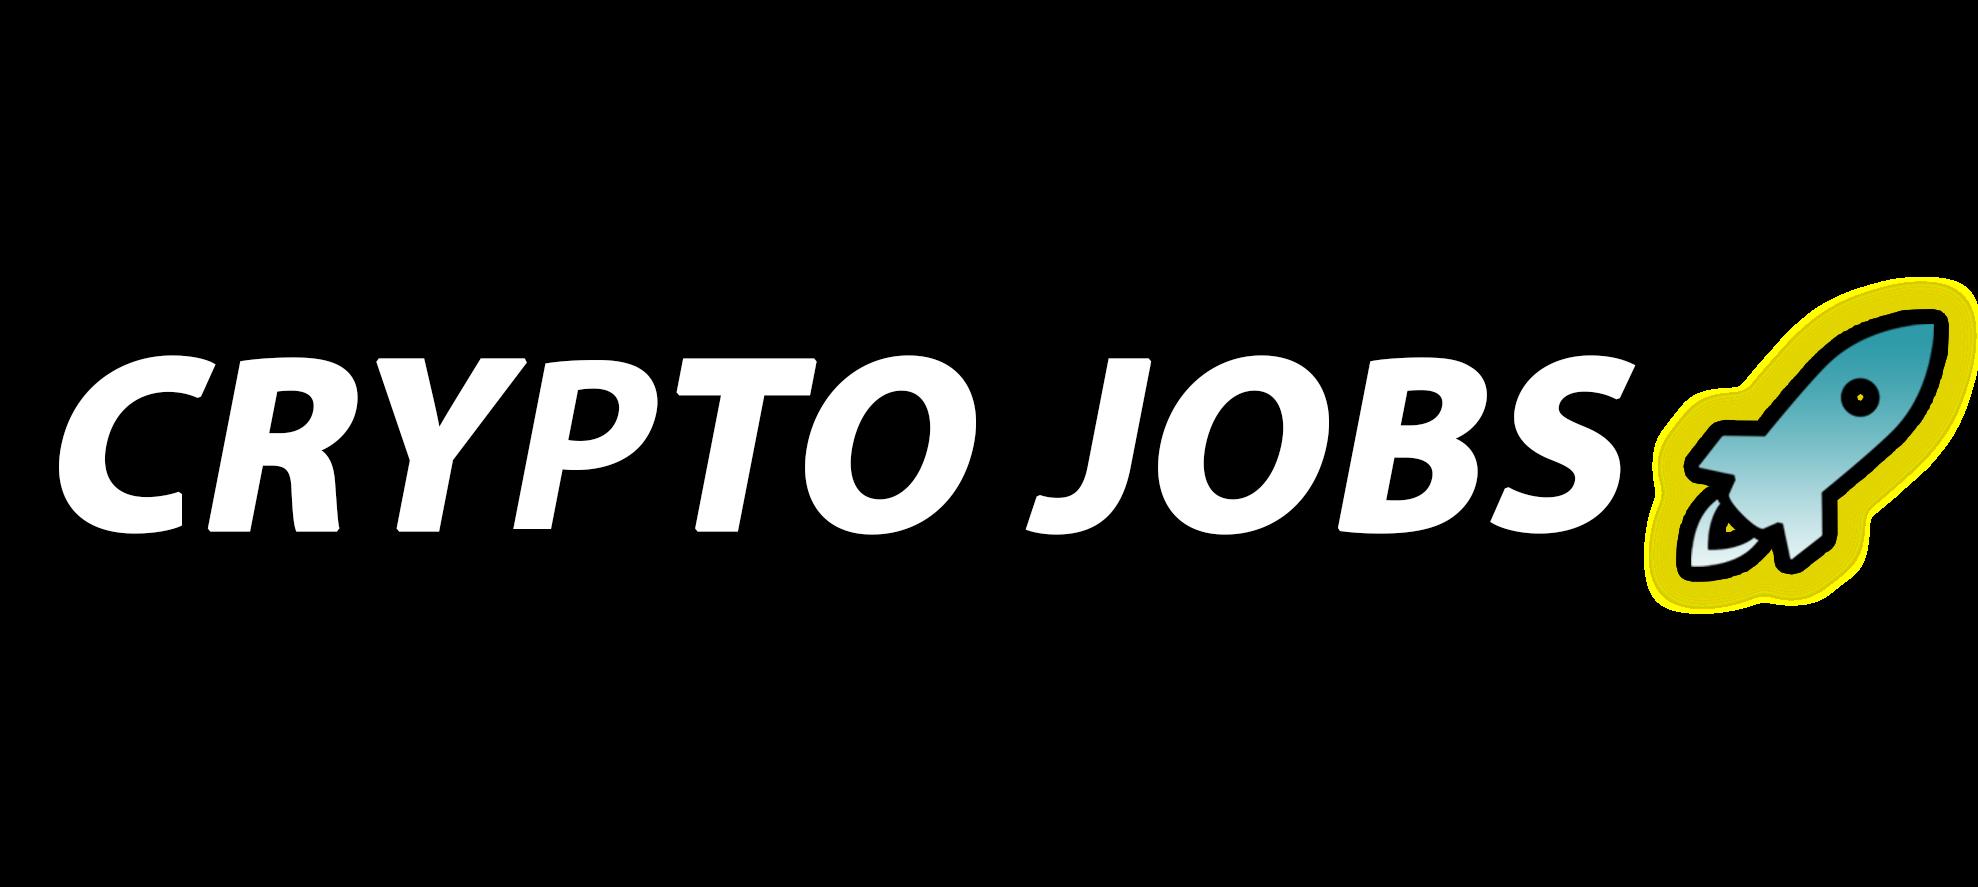 PompCryptoJobs